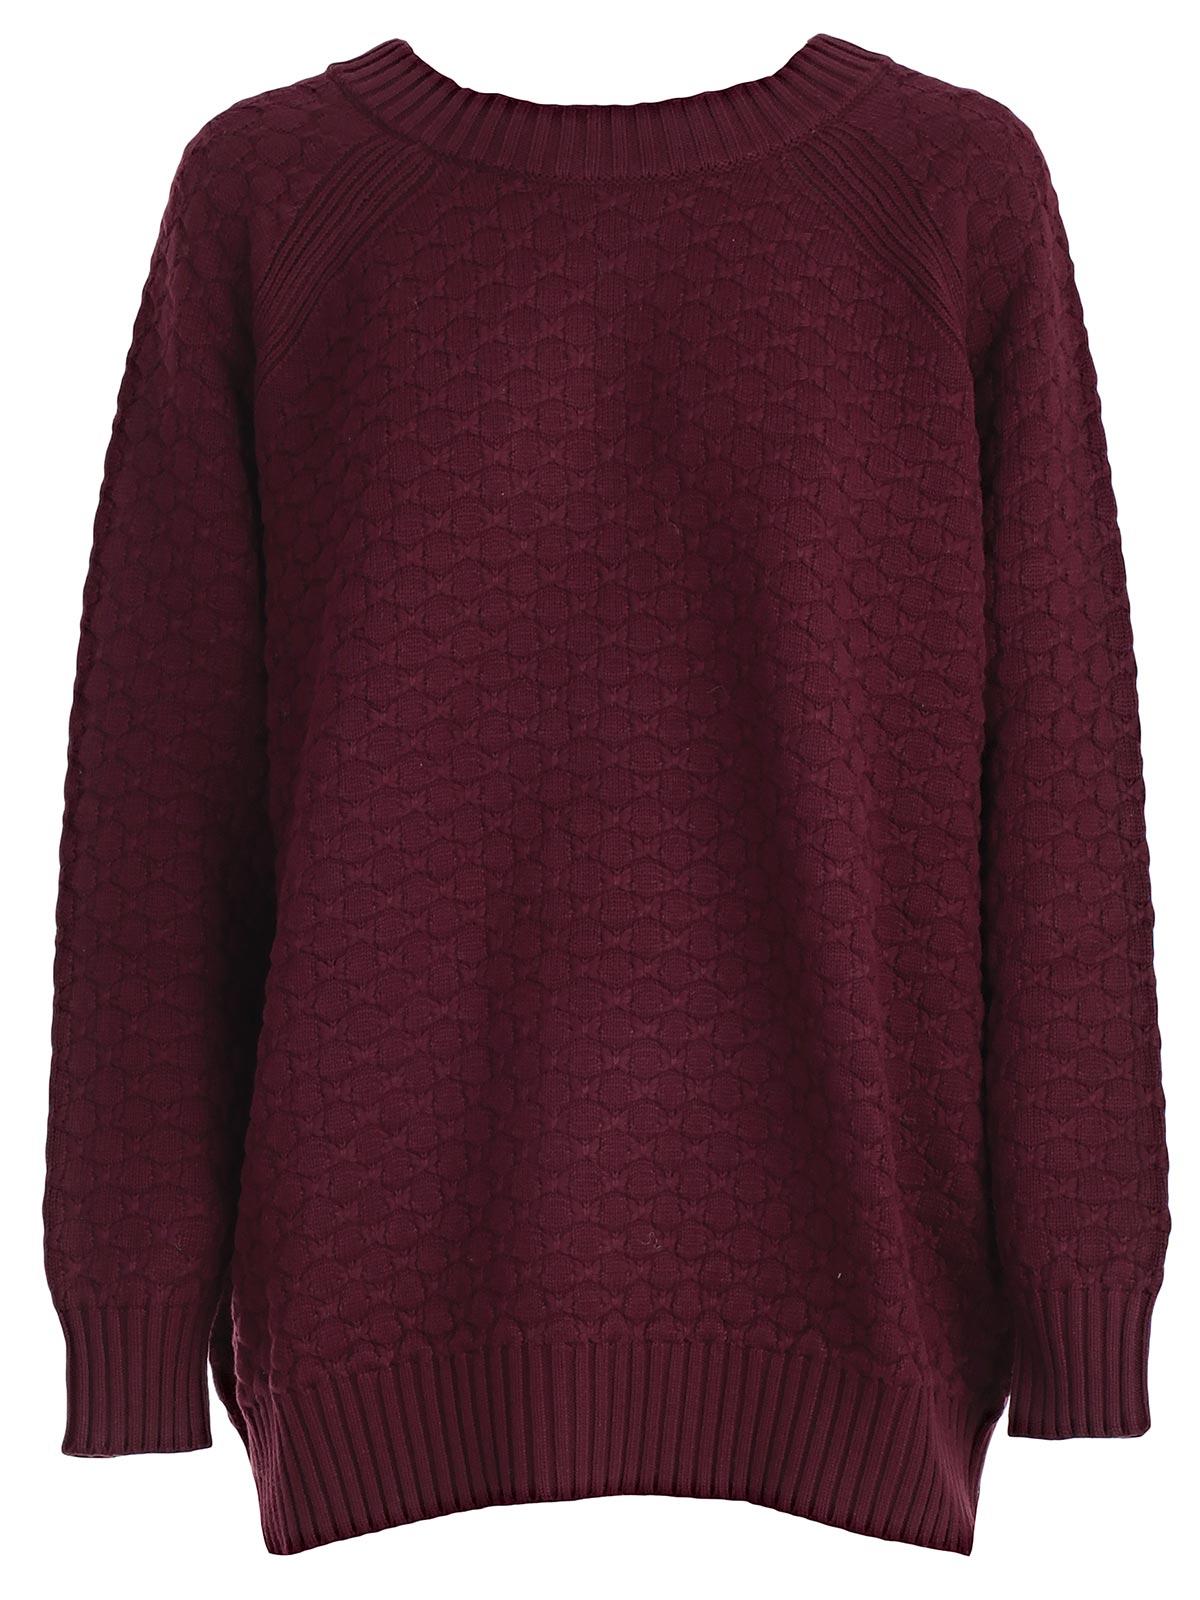 Picture of Seebychloe Sweater